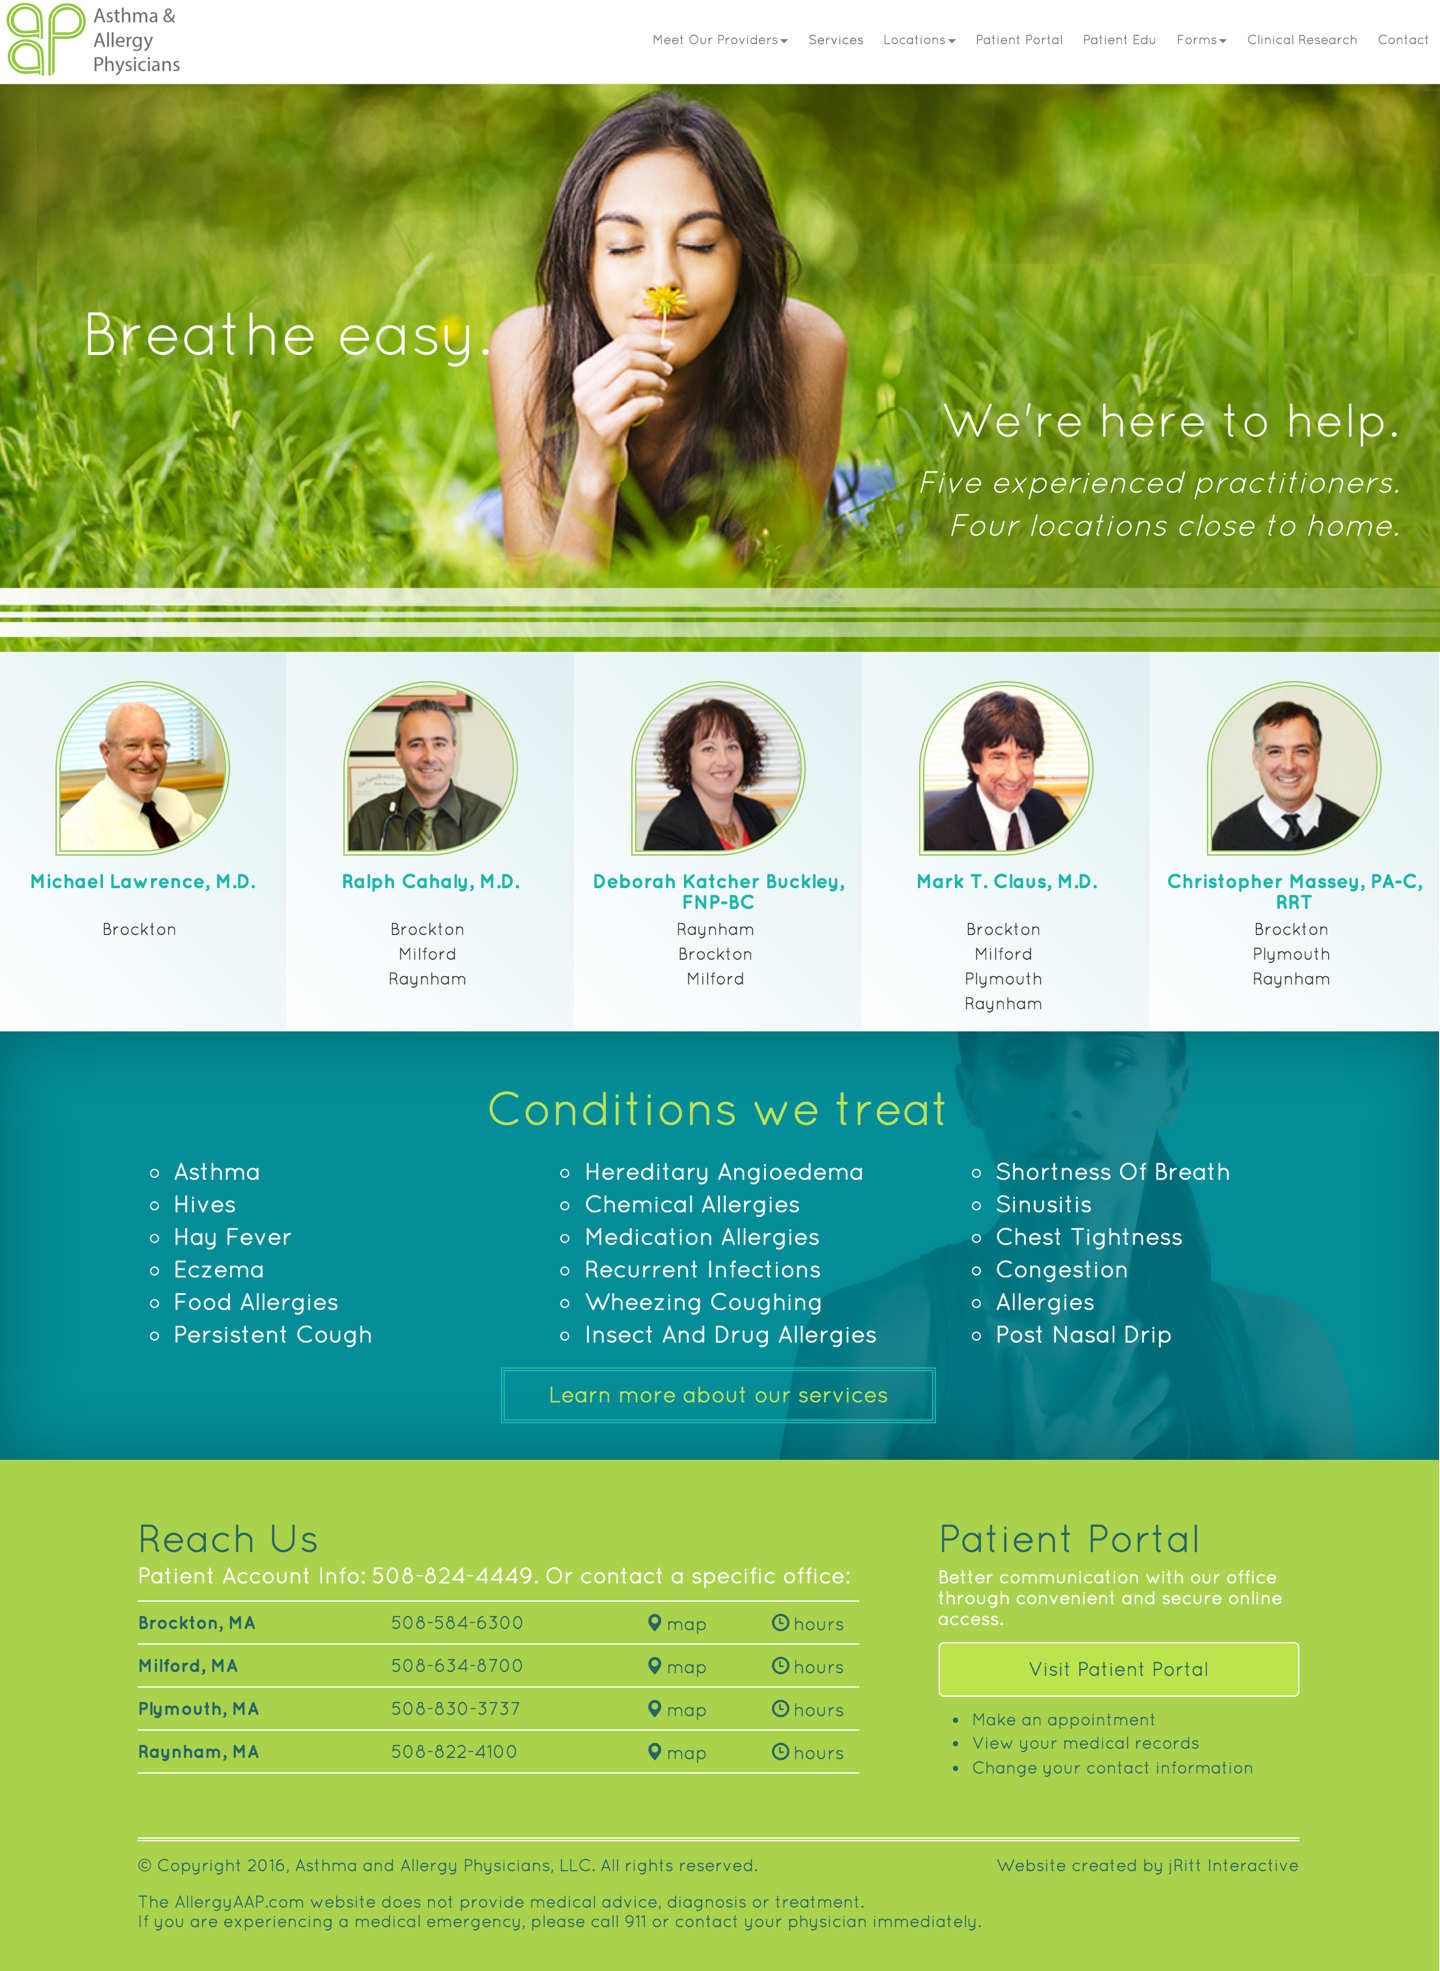 Medical site website and branding